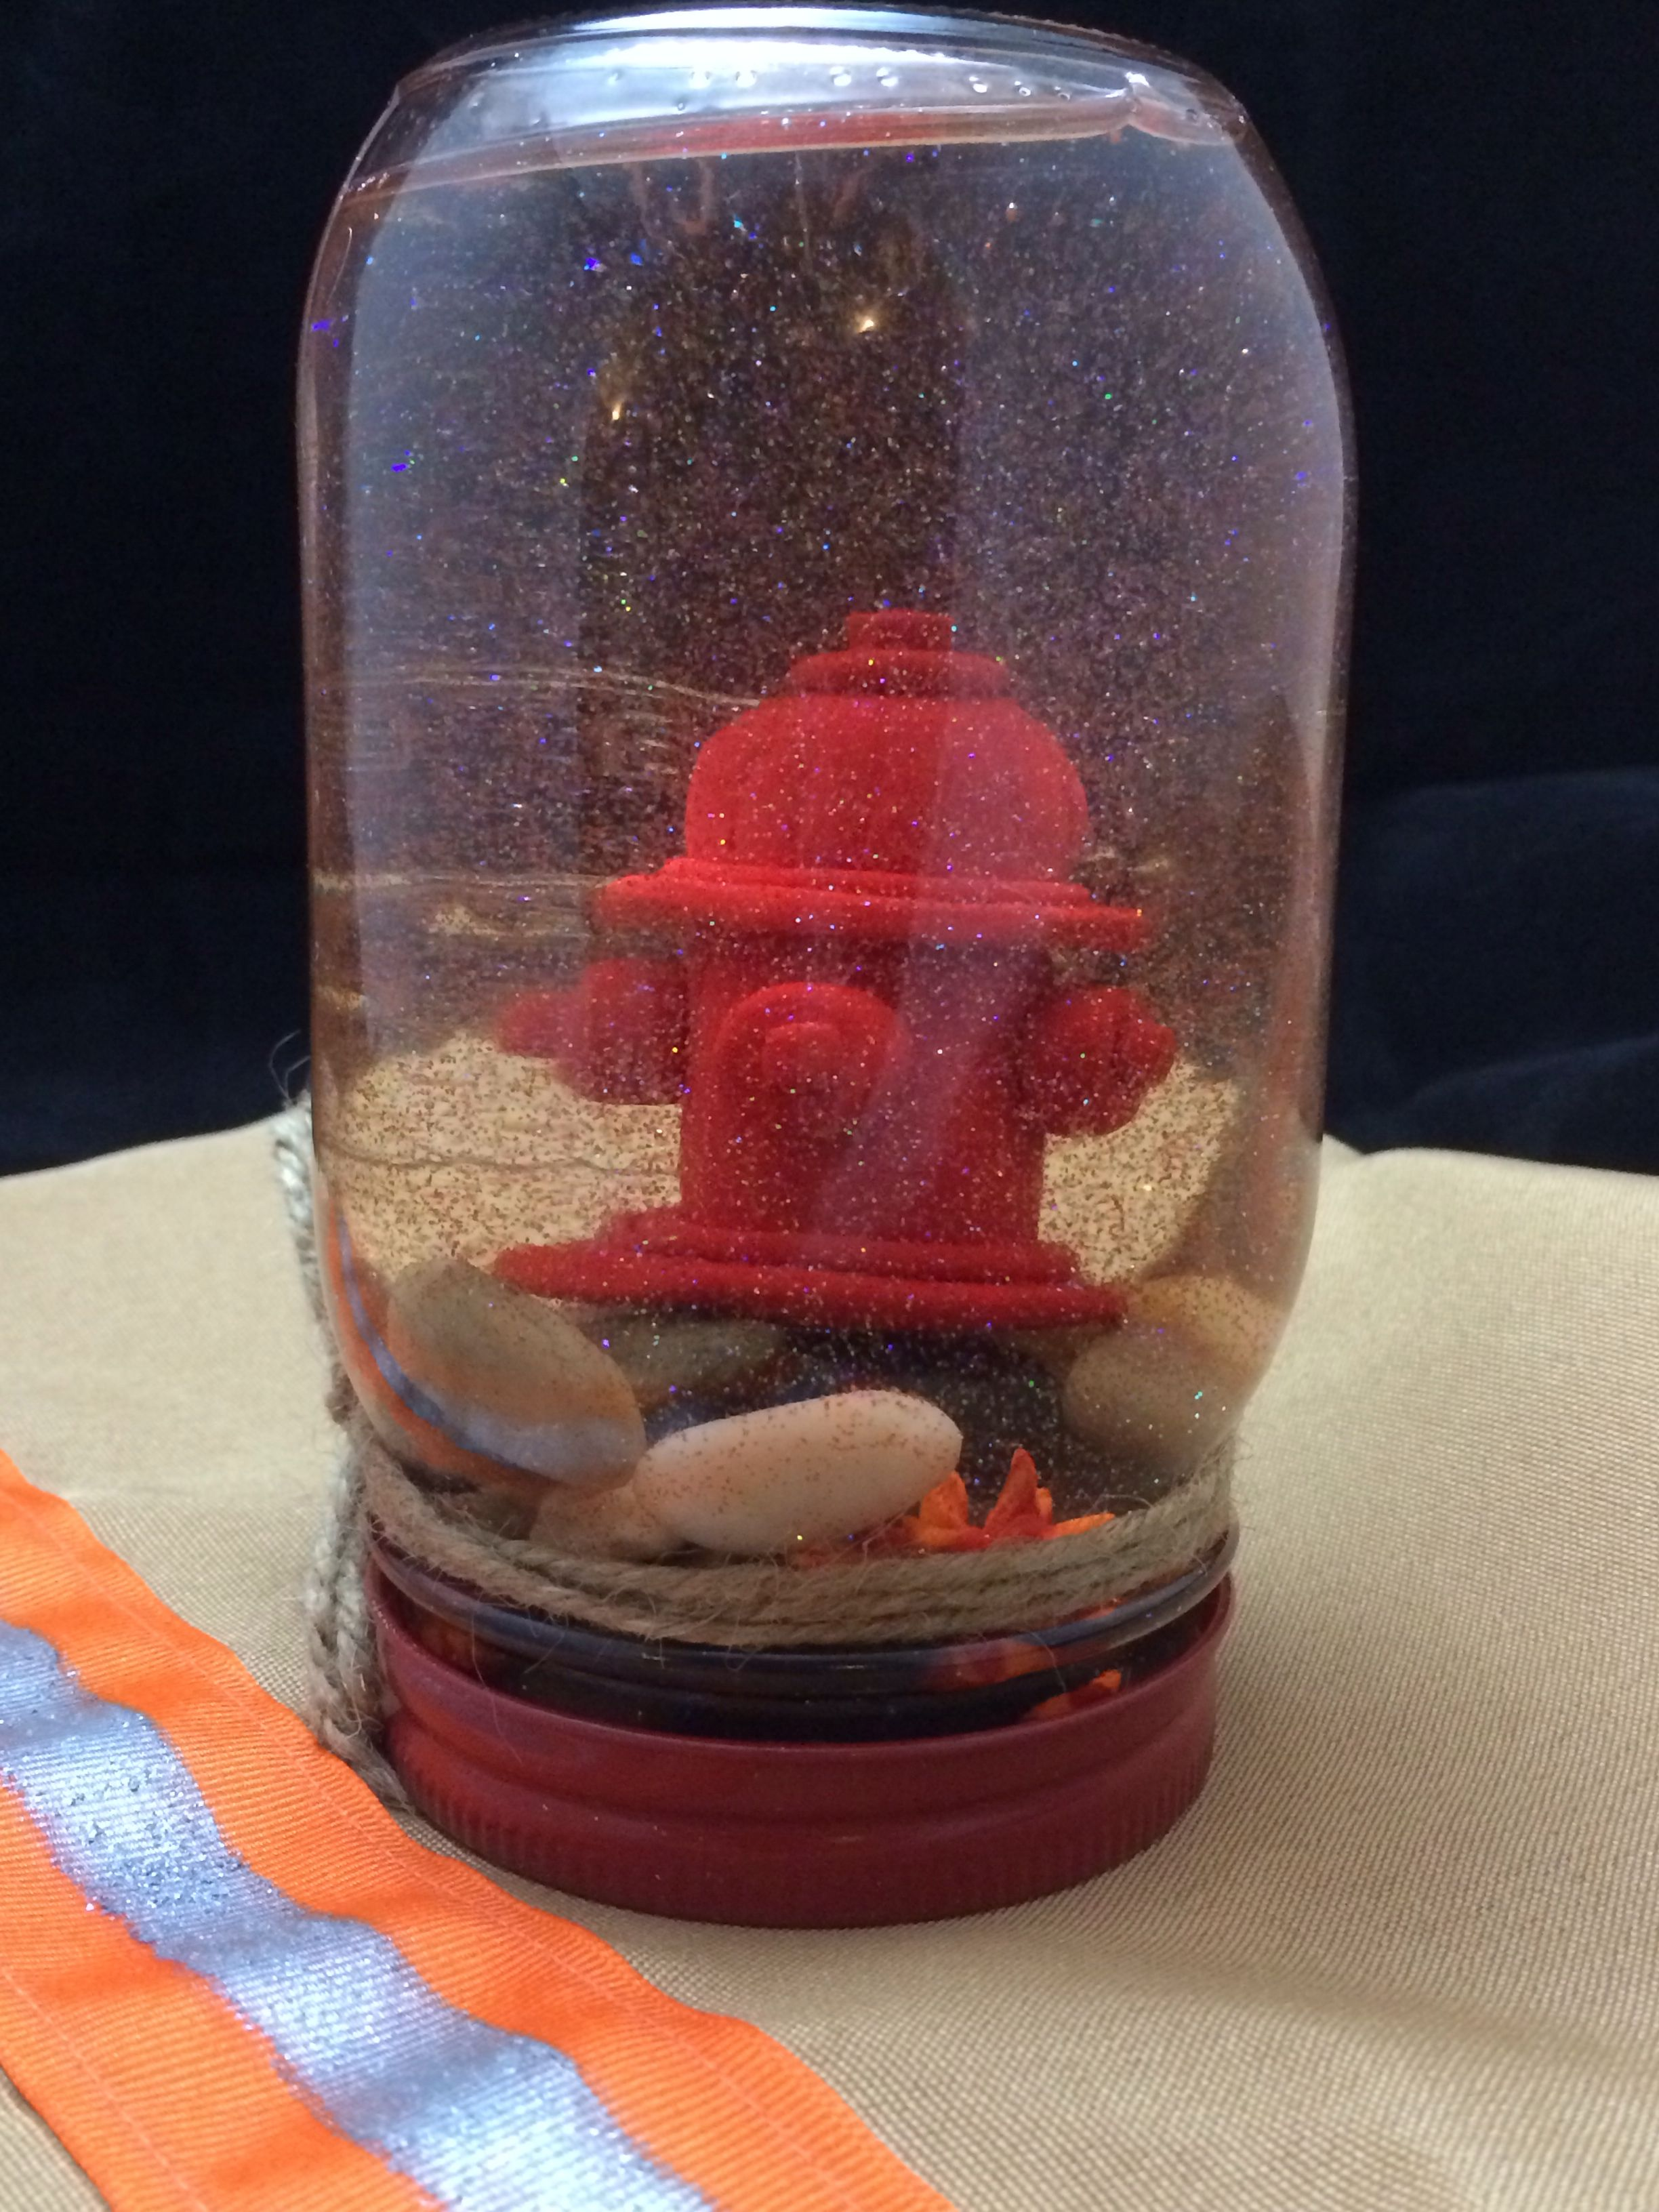 Fire dept snow globe mason jar red spray painted lid sculpey